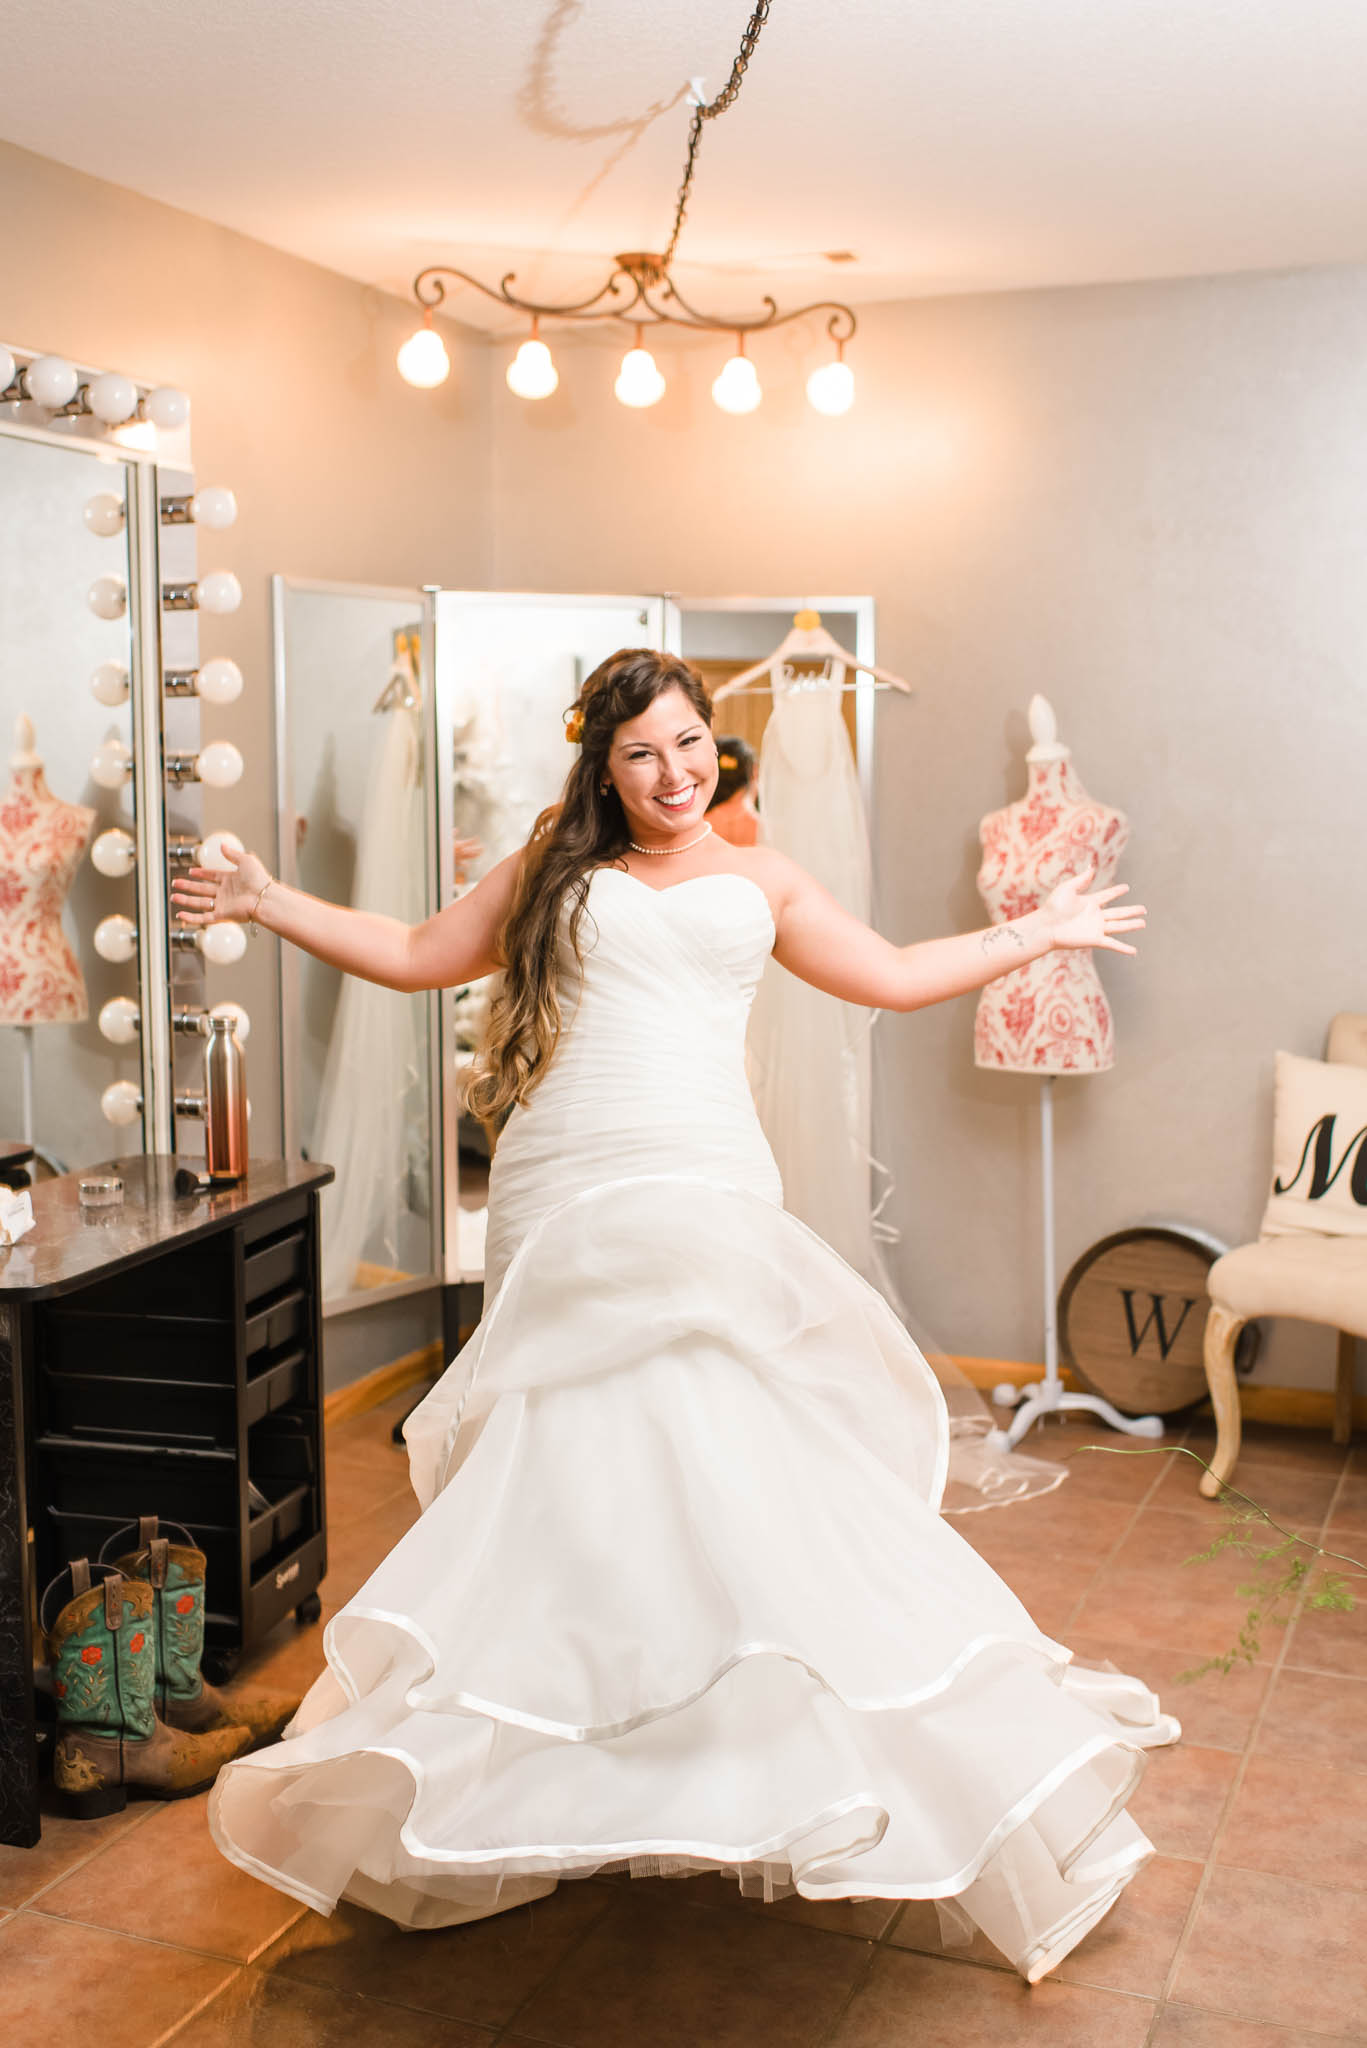 bride doing a little happy dance in her wedding dress